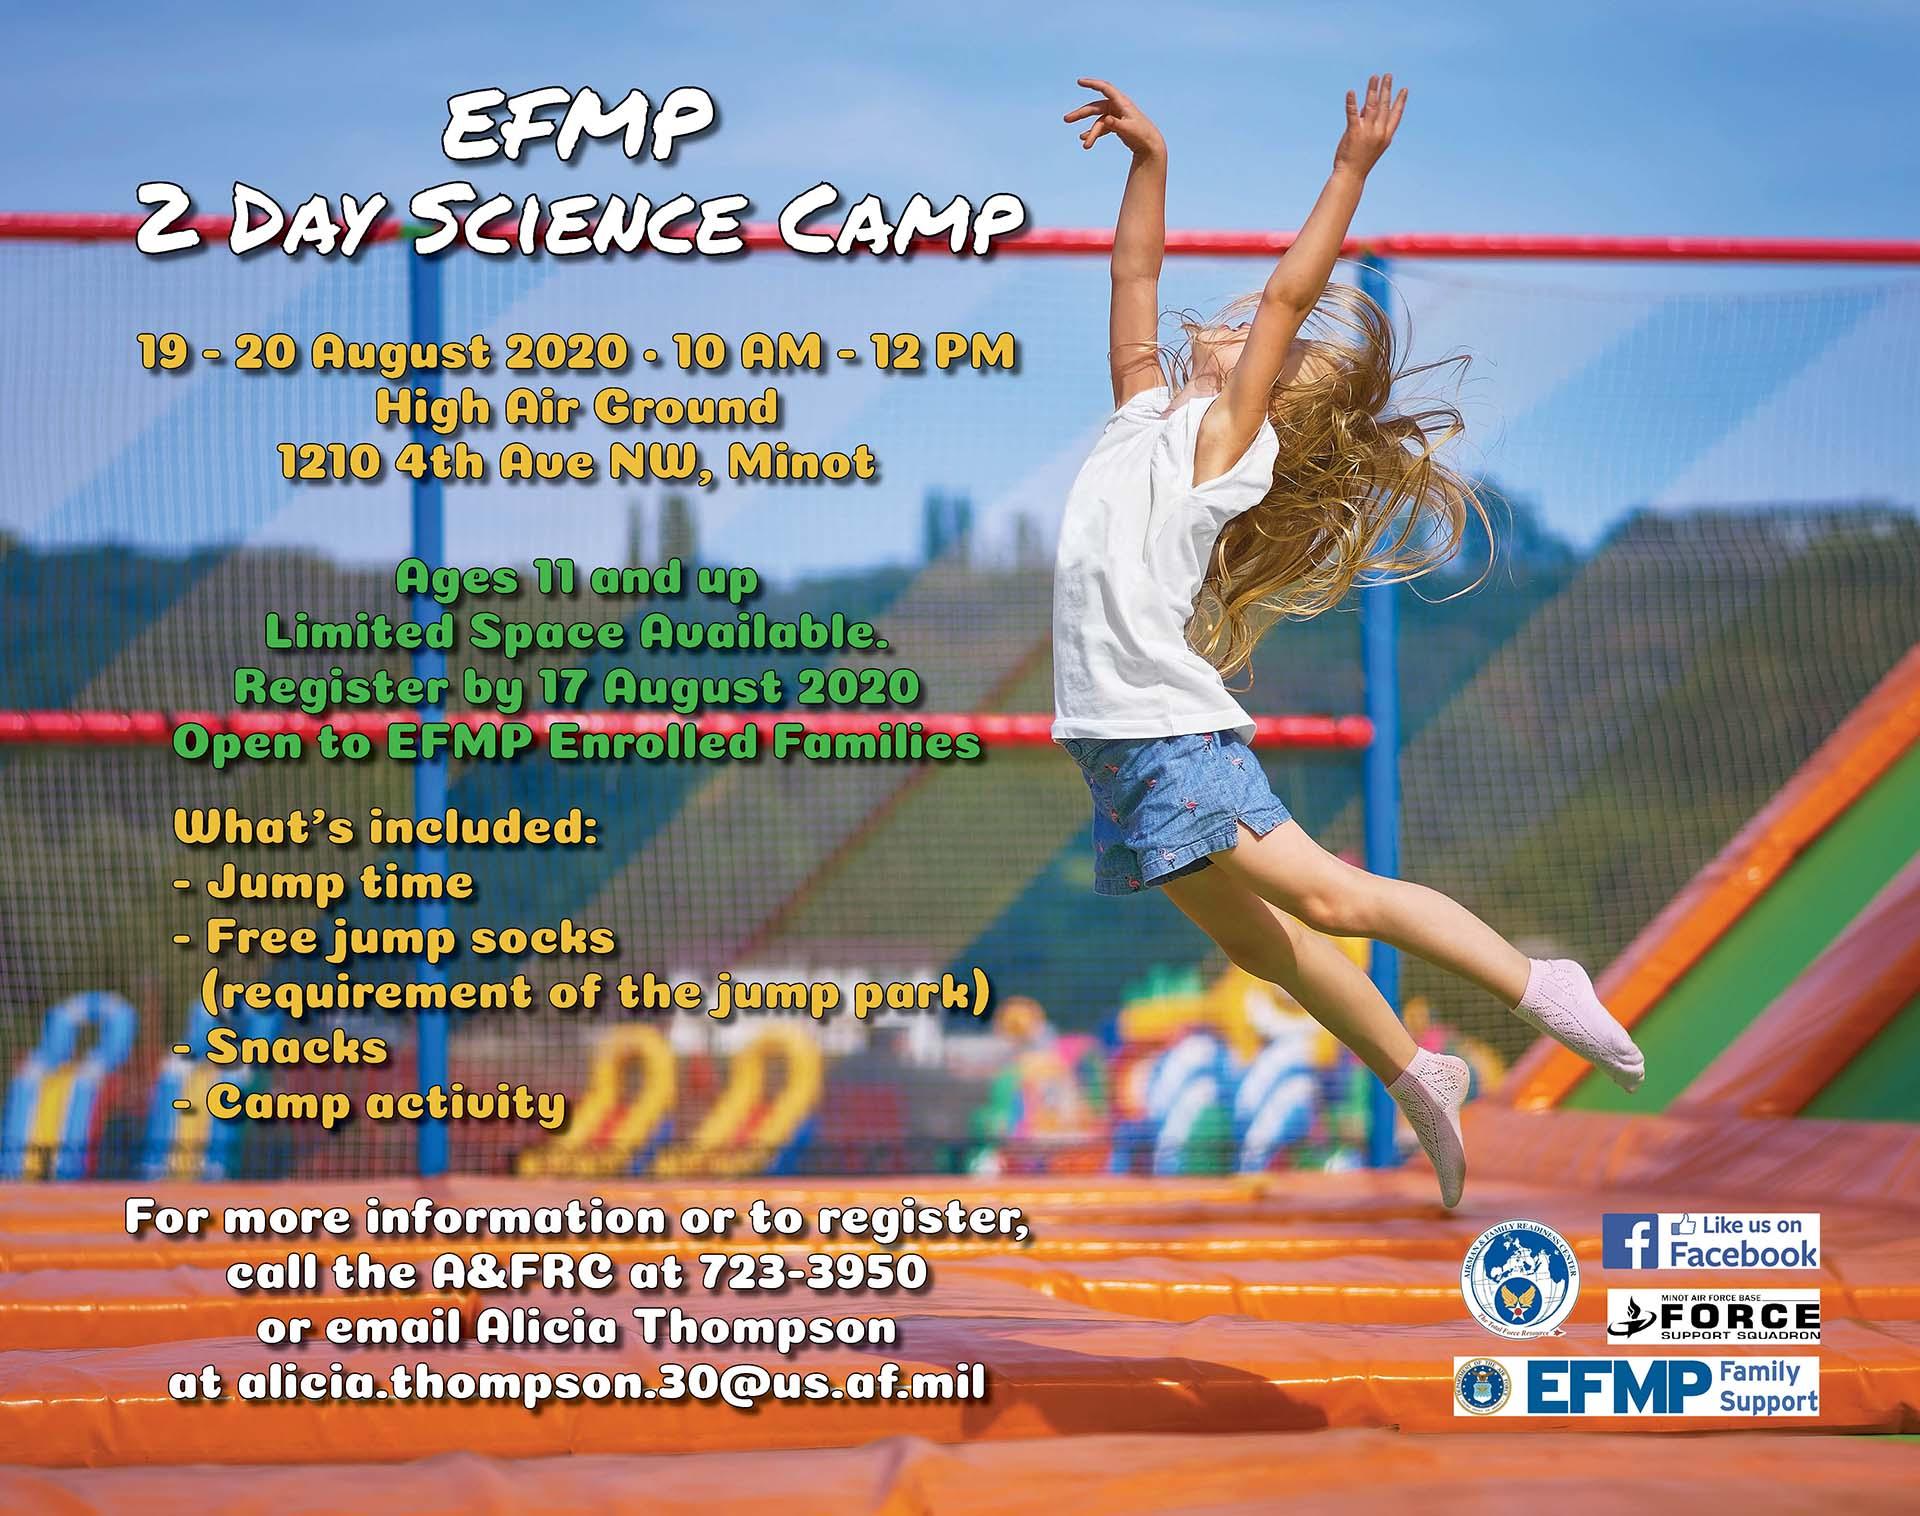 EFMP 2 Day Science Camp